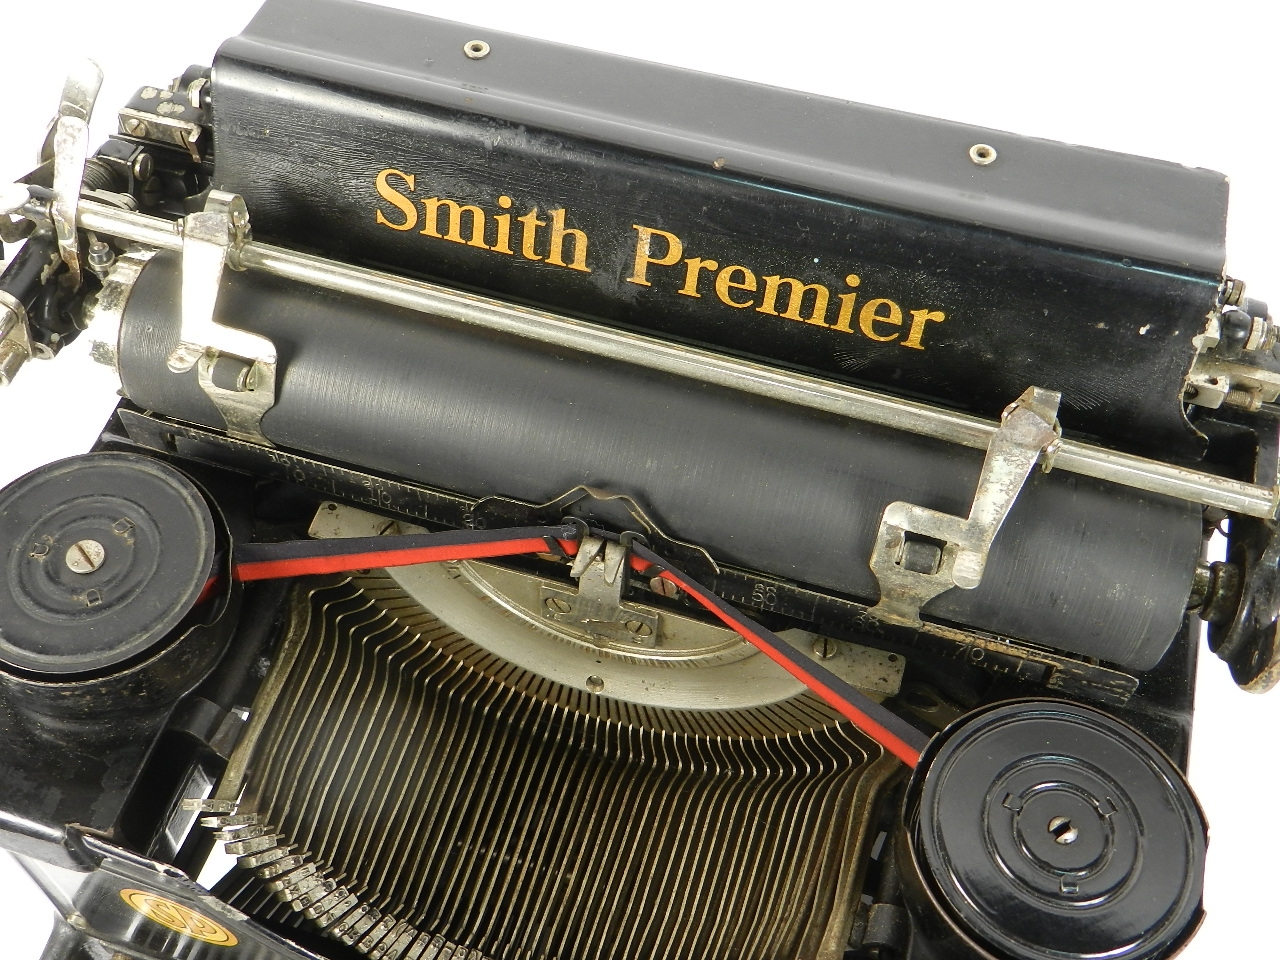 Imagen SMITH PREMIER Mod 50 AÑO 1923 31204